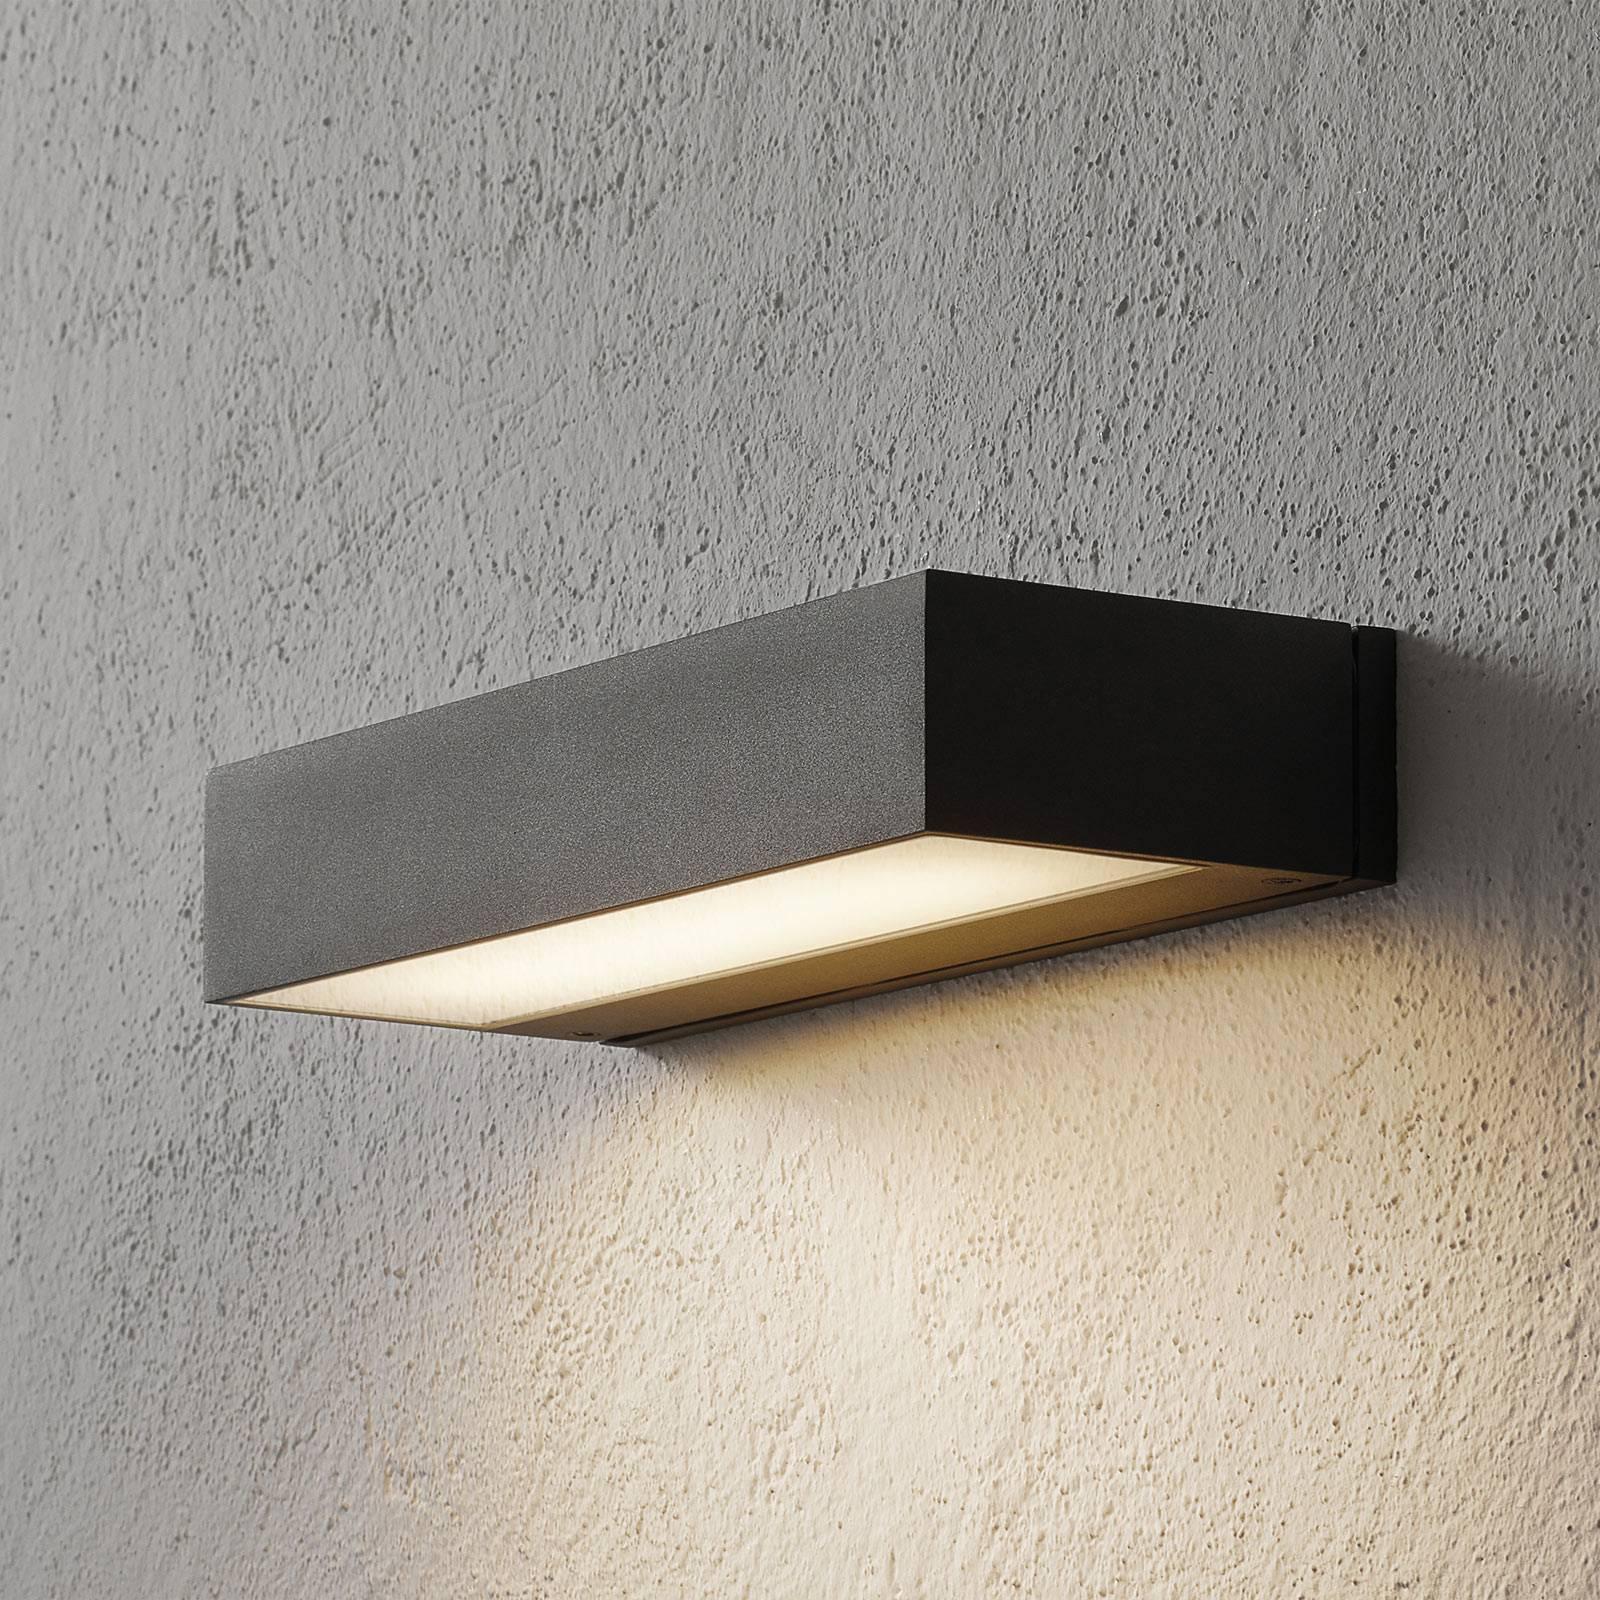 BEGA 33329 LED-seinälamppu 3000K 30 cm down hopea